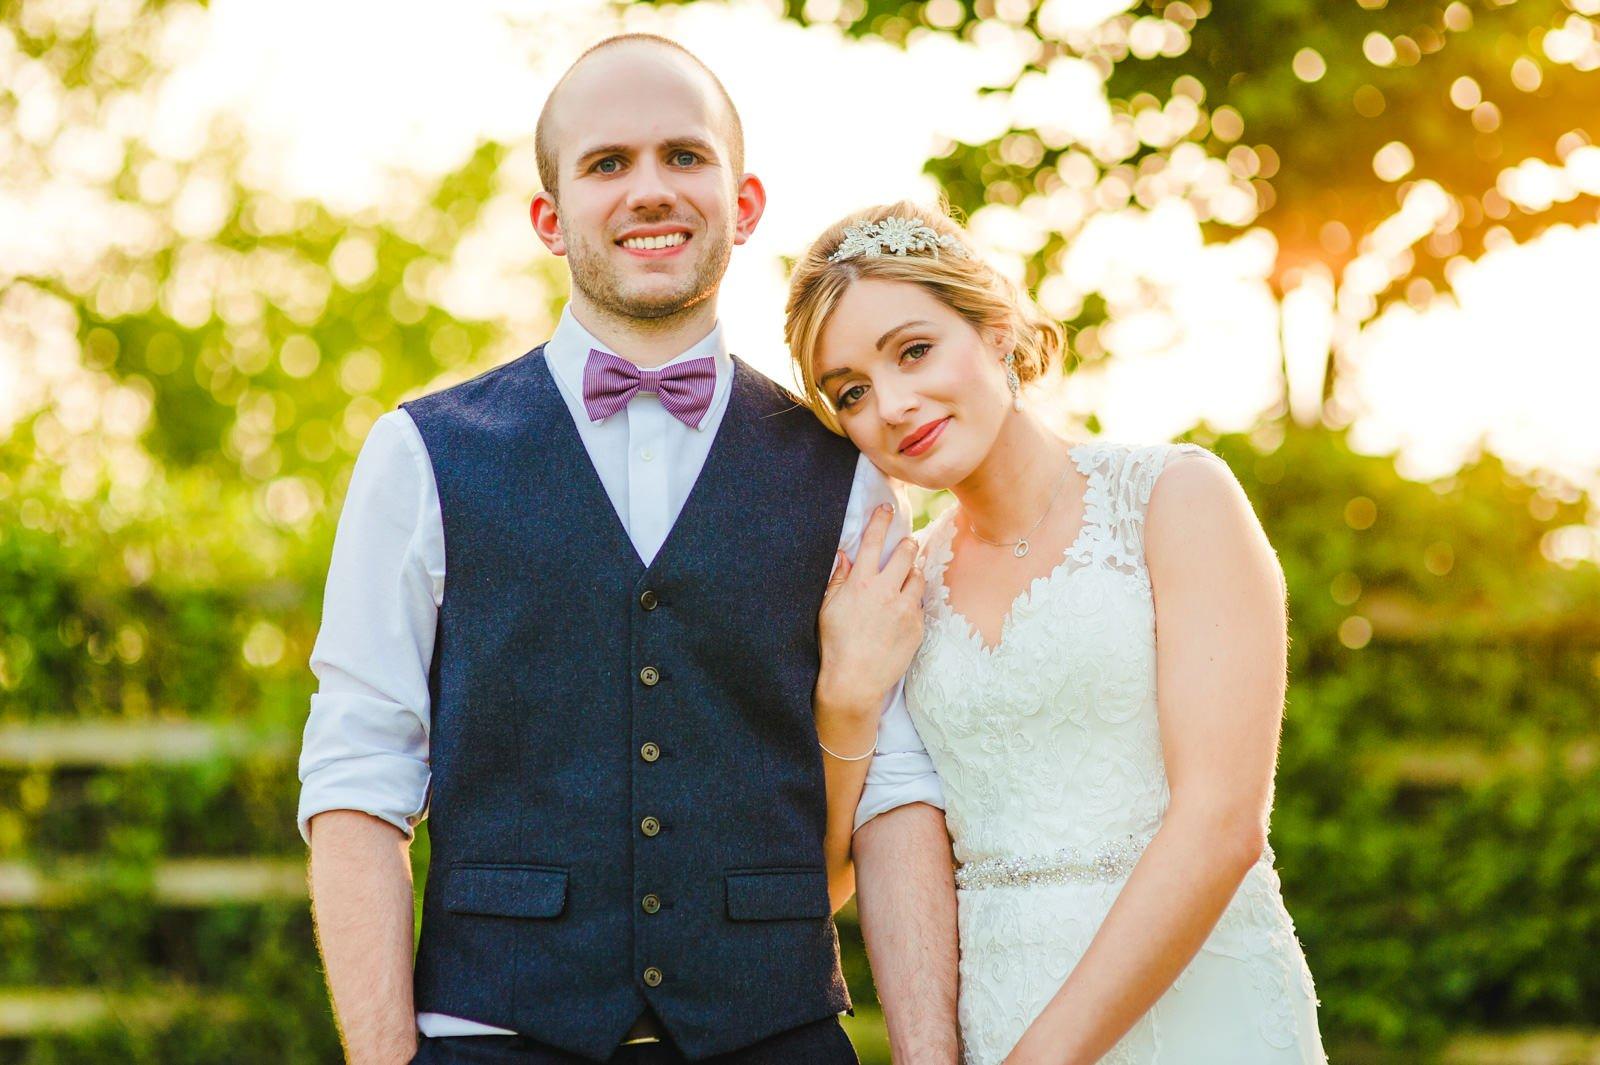 Millers Of Netley wedding, Dorrington, Shrewsbury | Emma + Ben 91